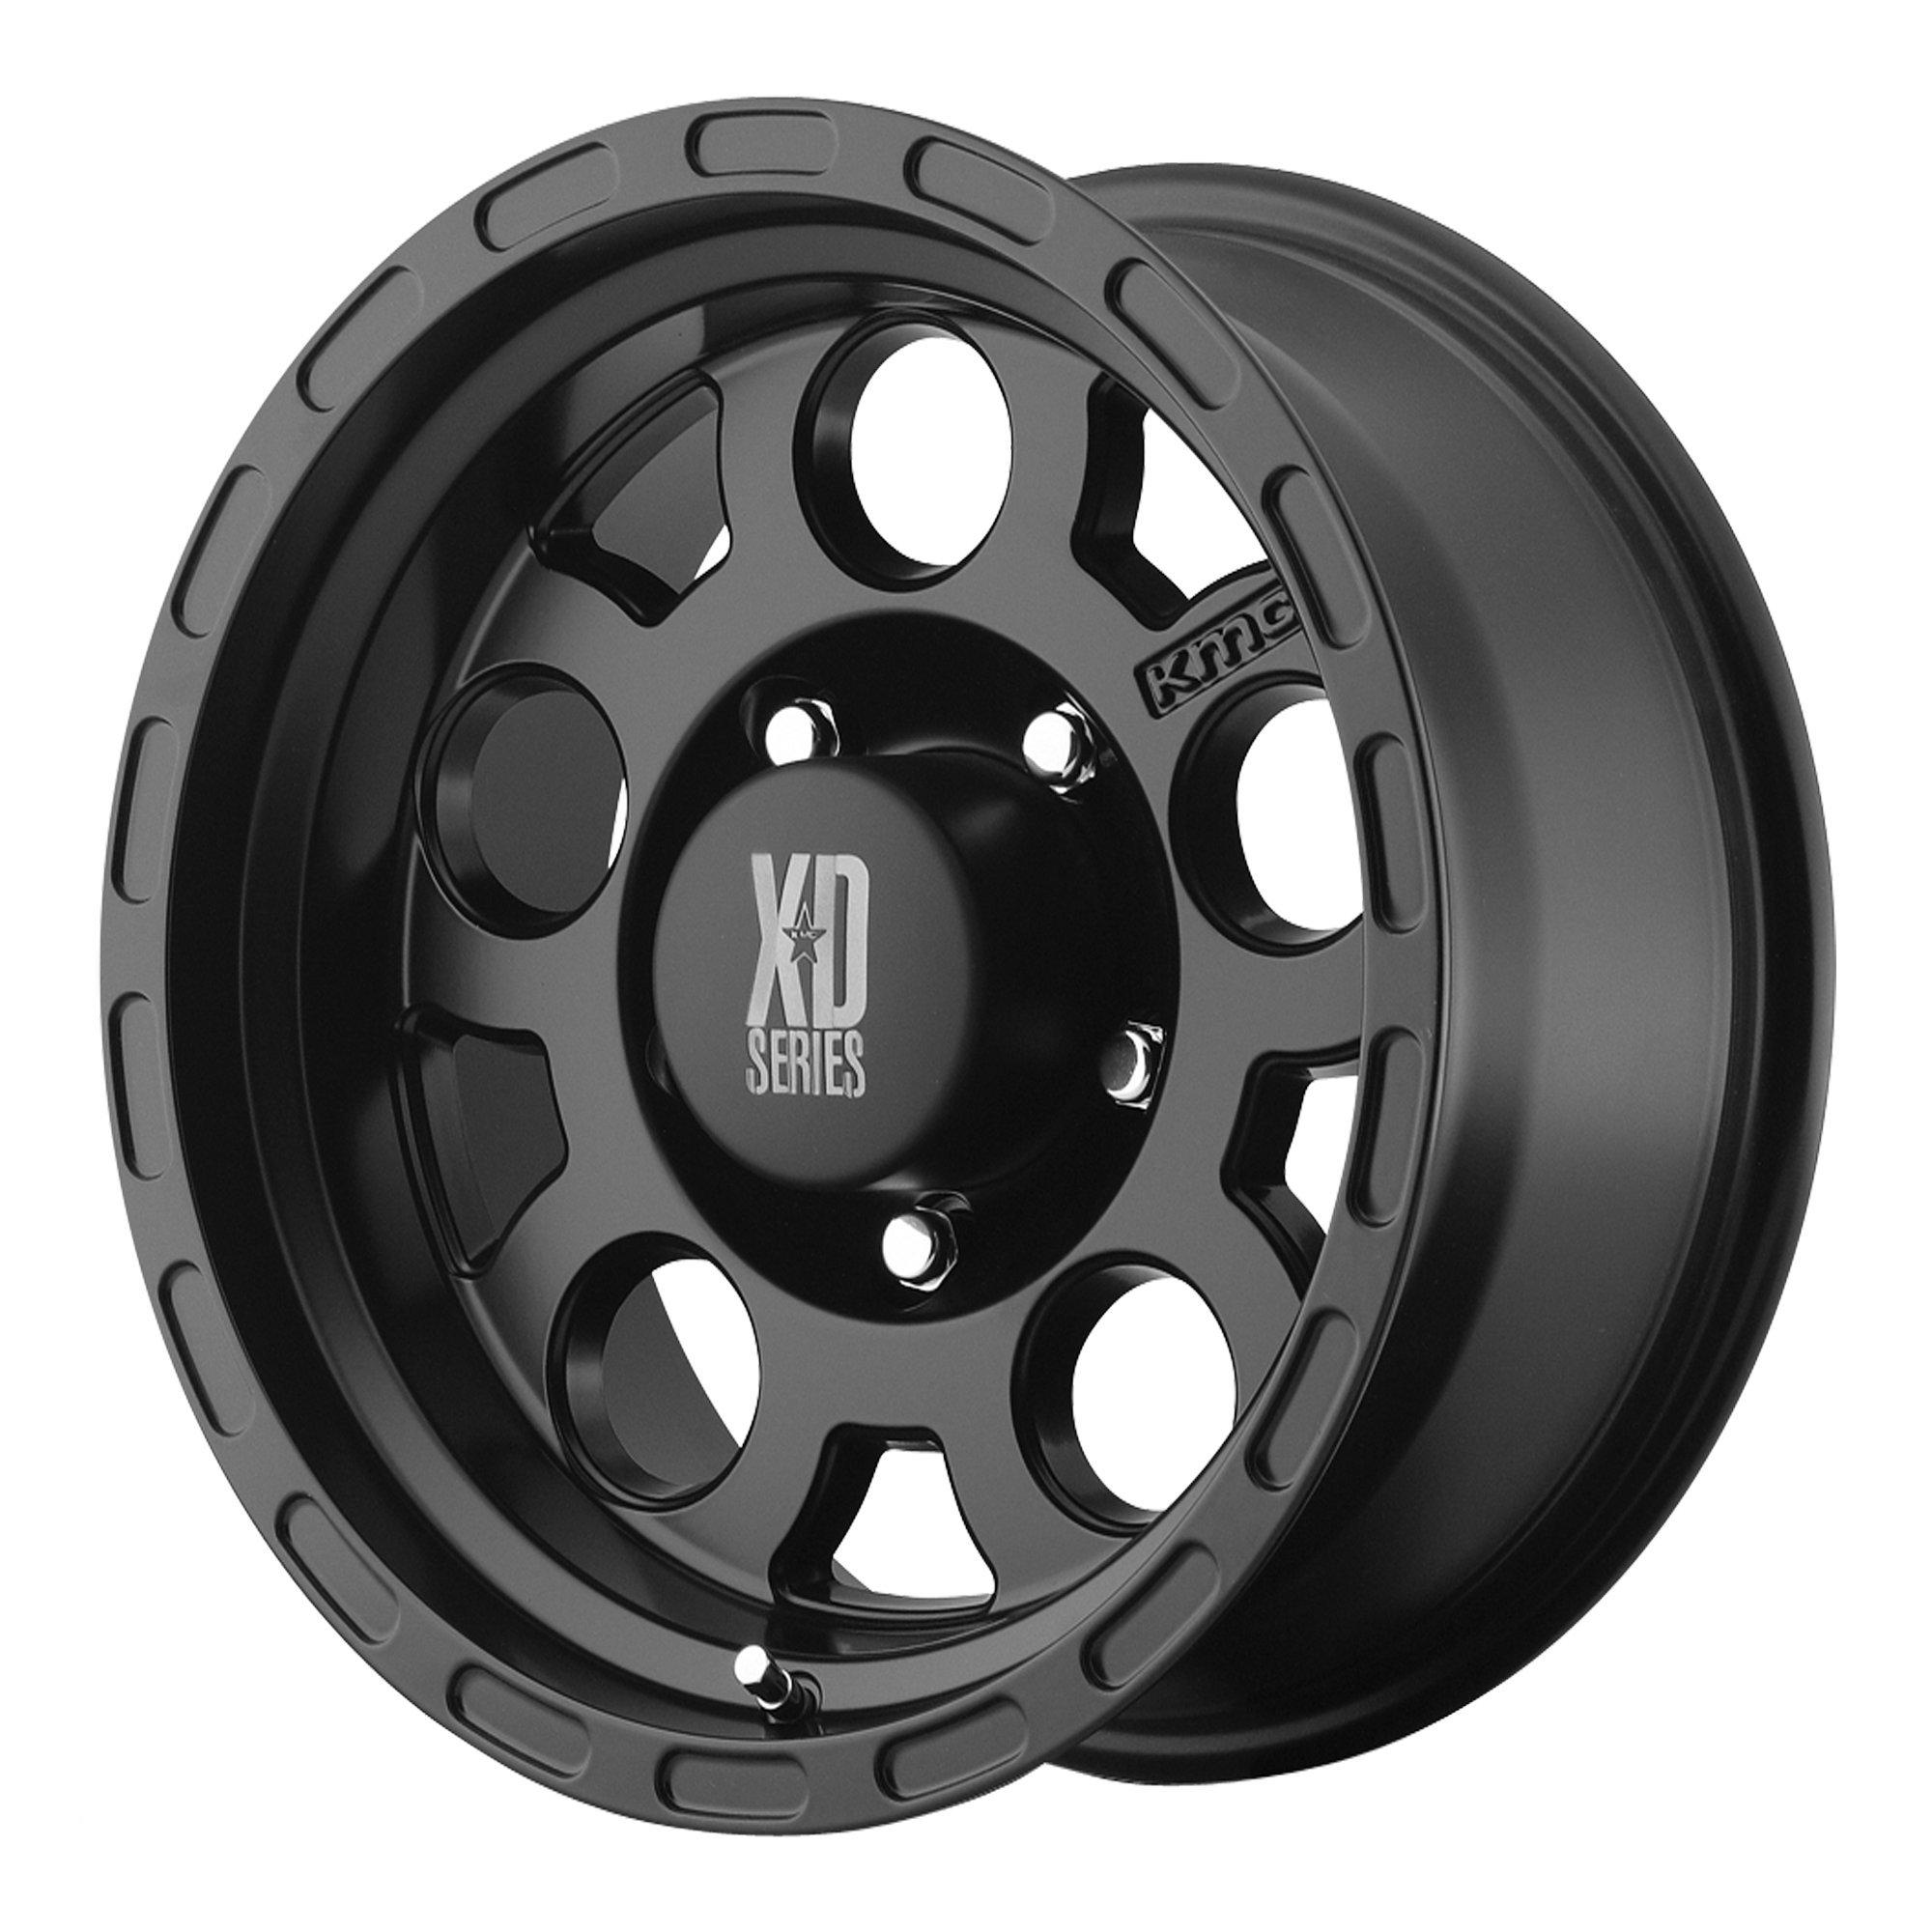 XD Series by KMC Wheels XD122 Enduro Matte Black Wheel (15x9''/5x127mm, -12mm offset)